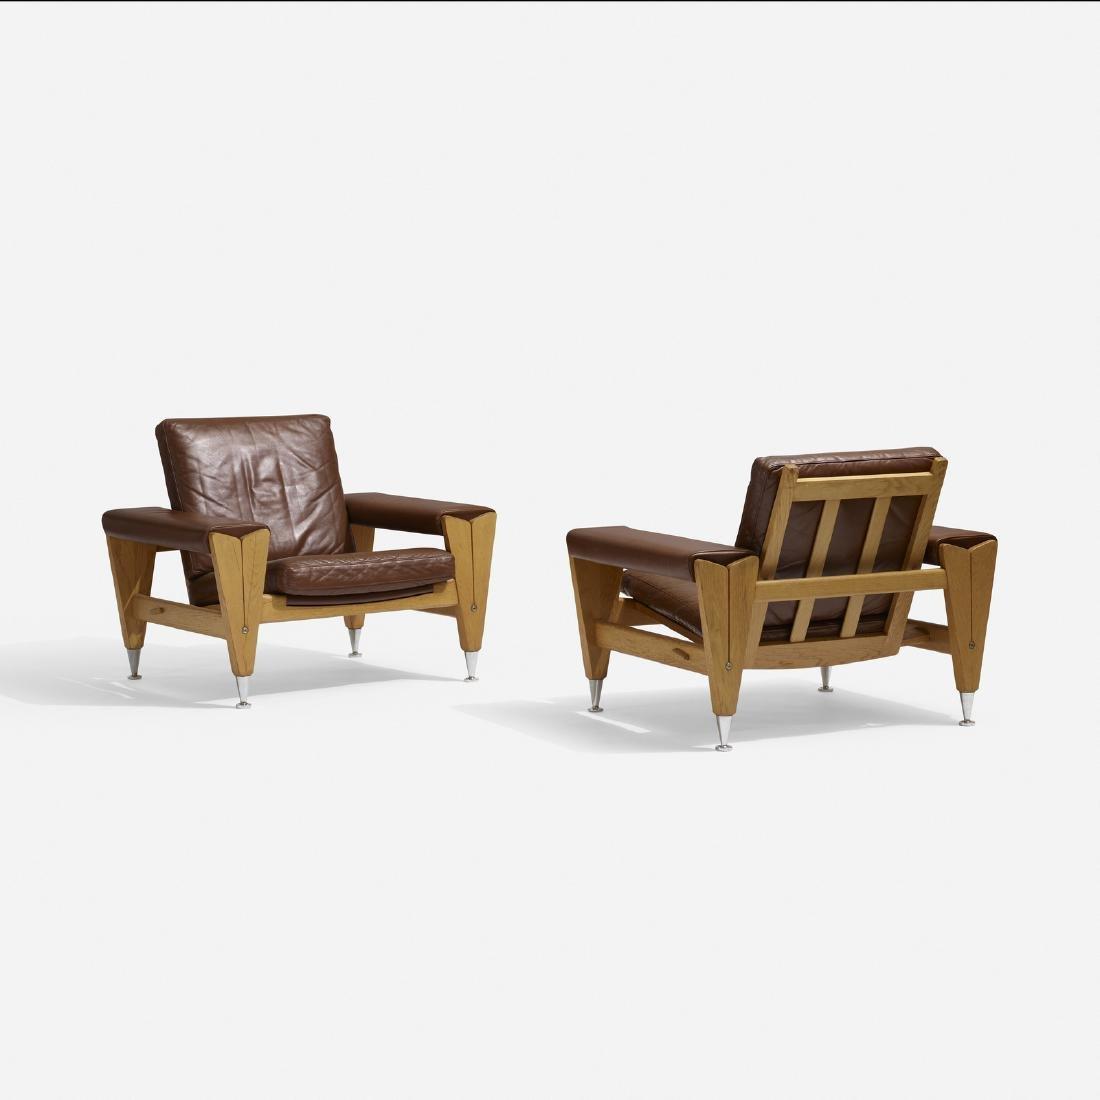 Hans J. Wegner, lounge chairs, pair - 2